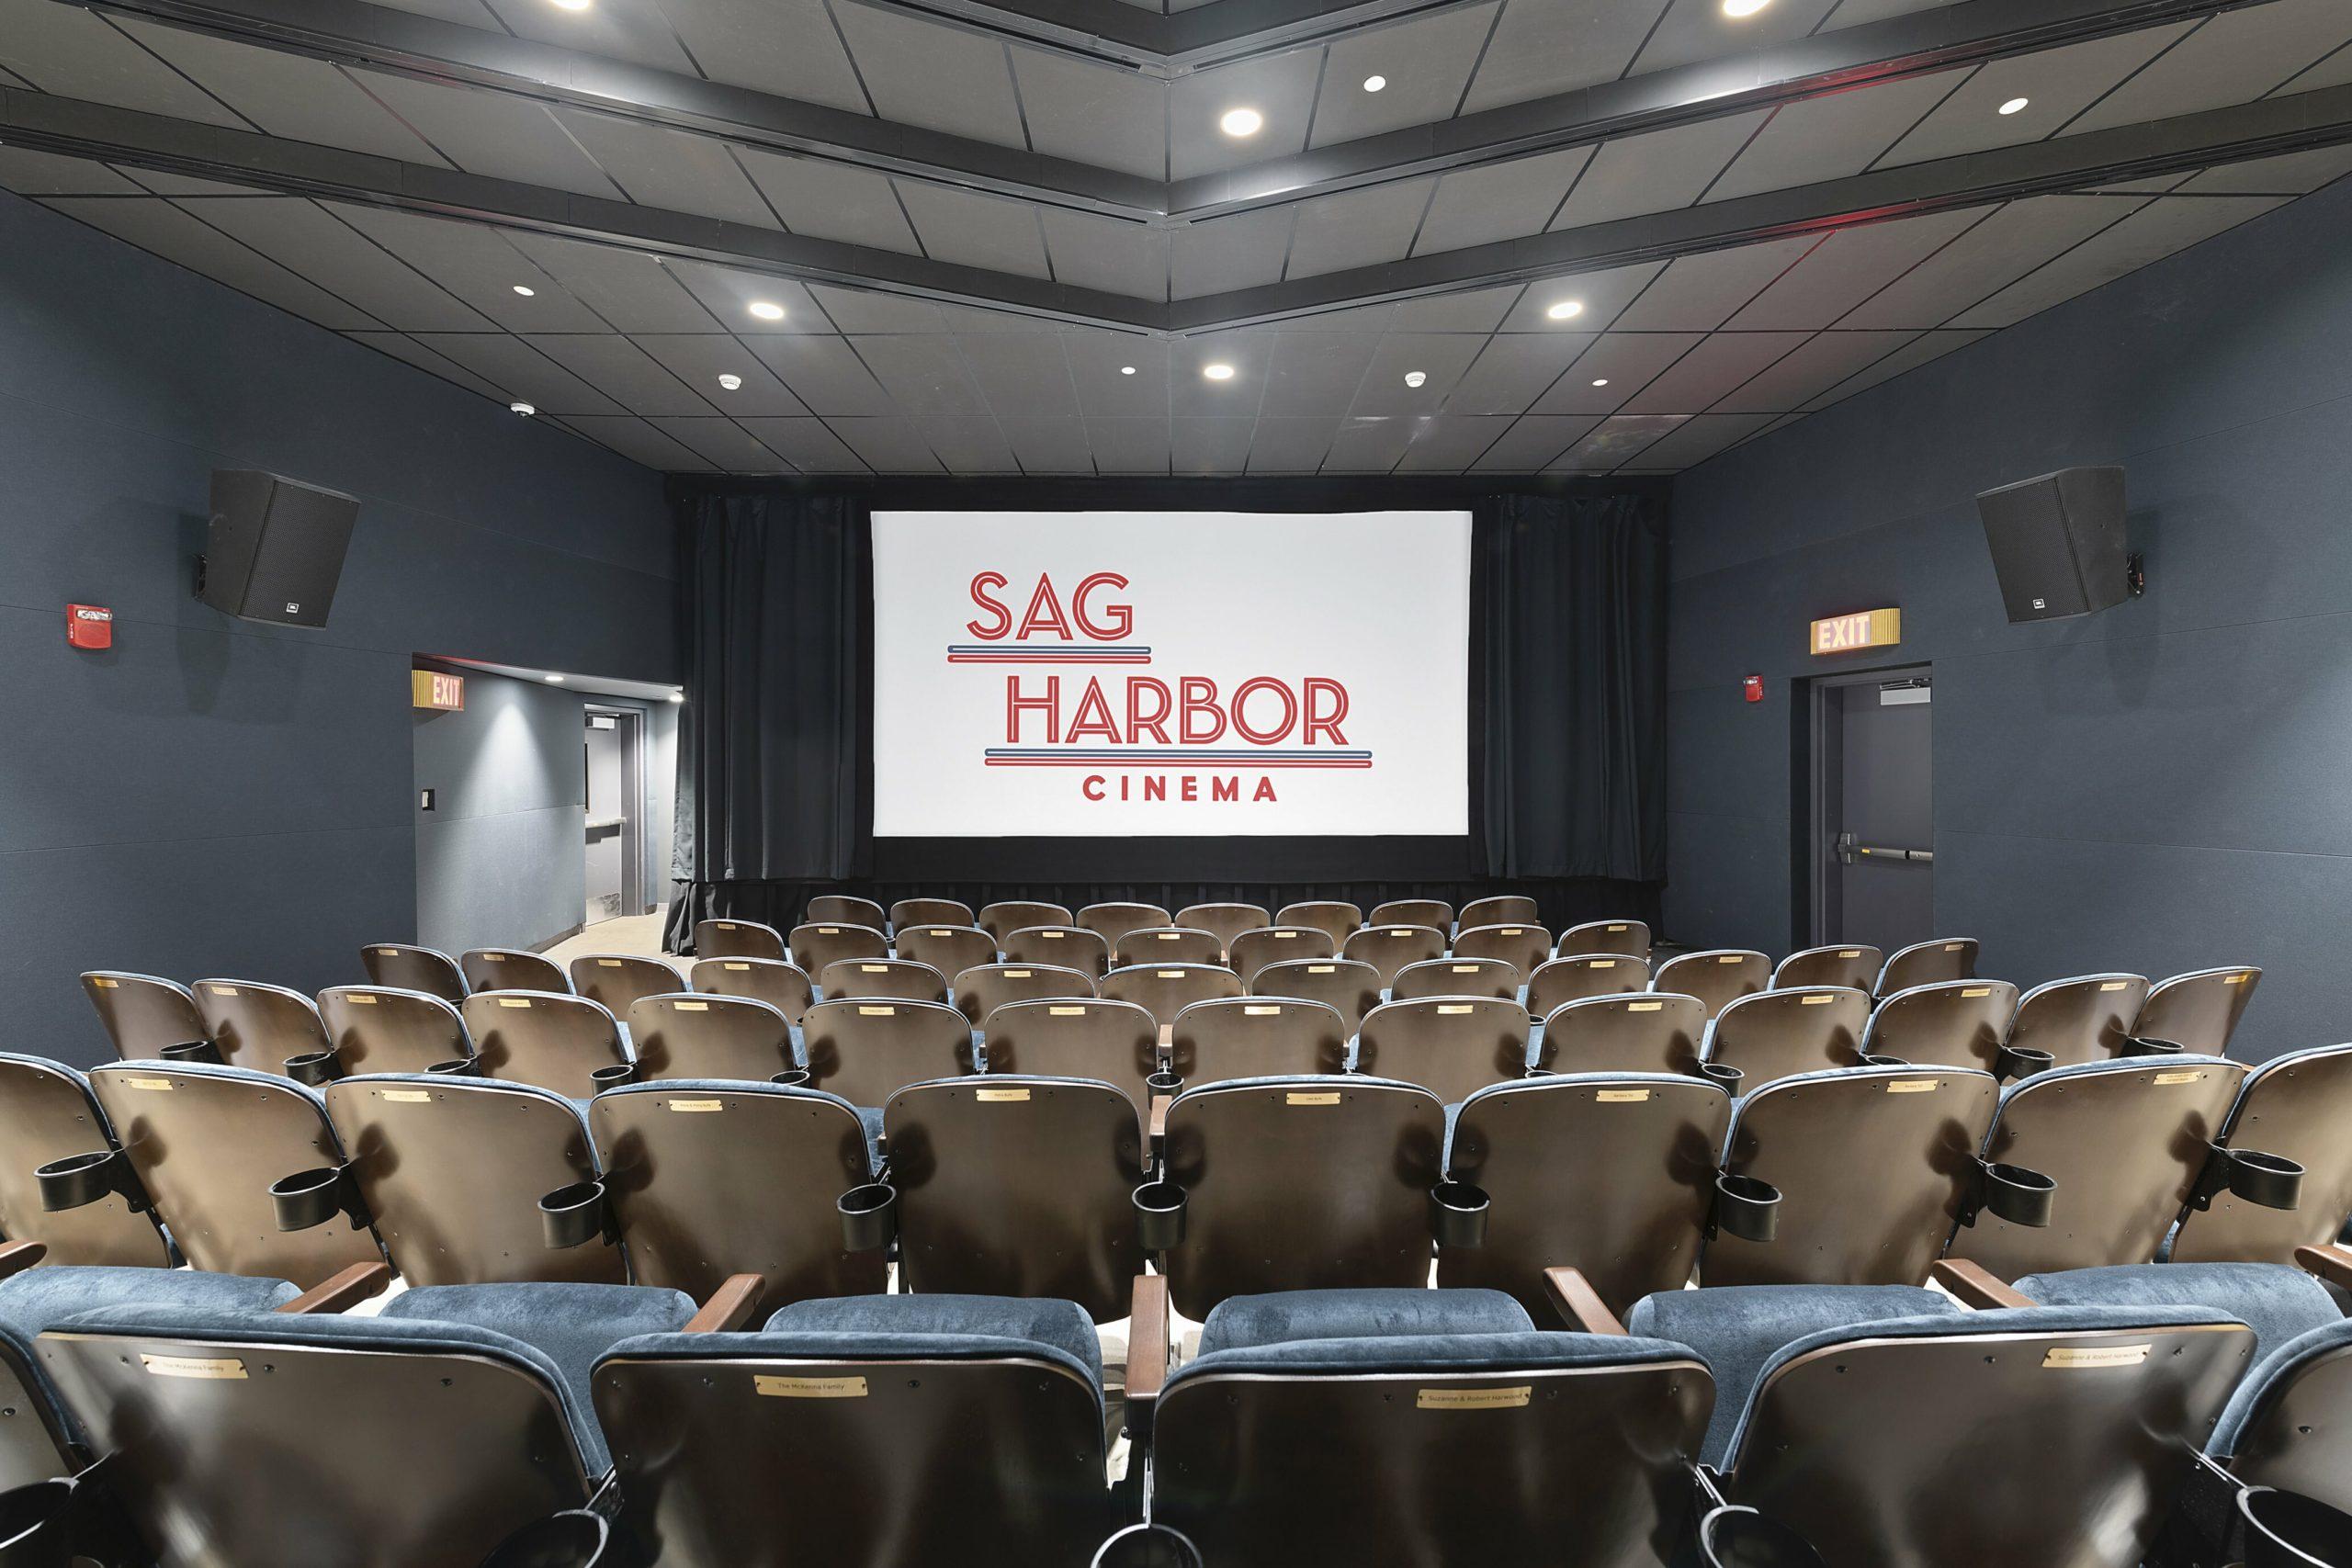 A sneak-peek inside the new Sag Harbor Cinema.